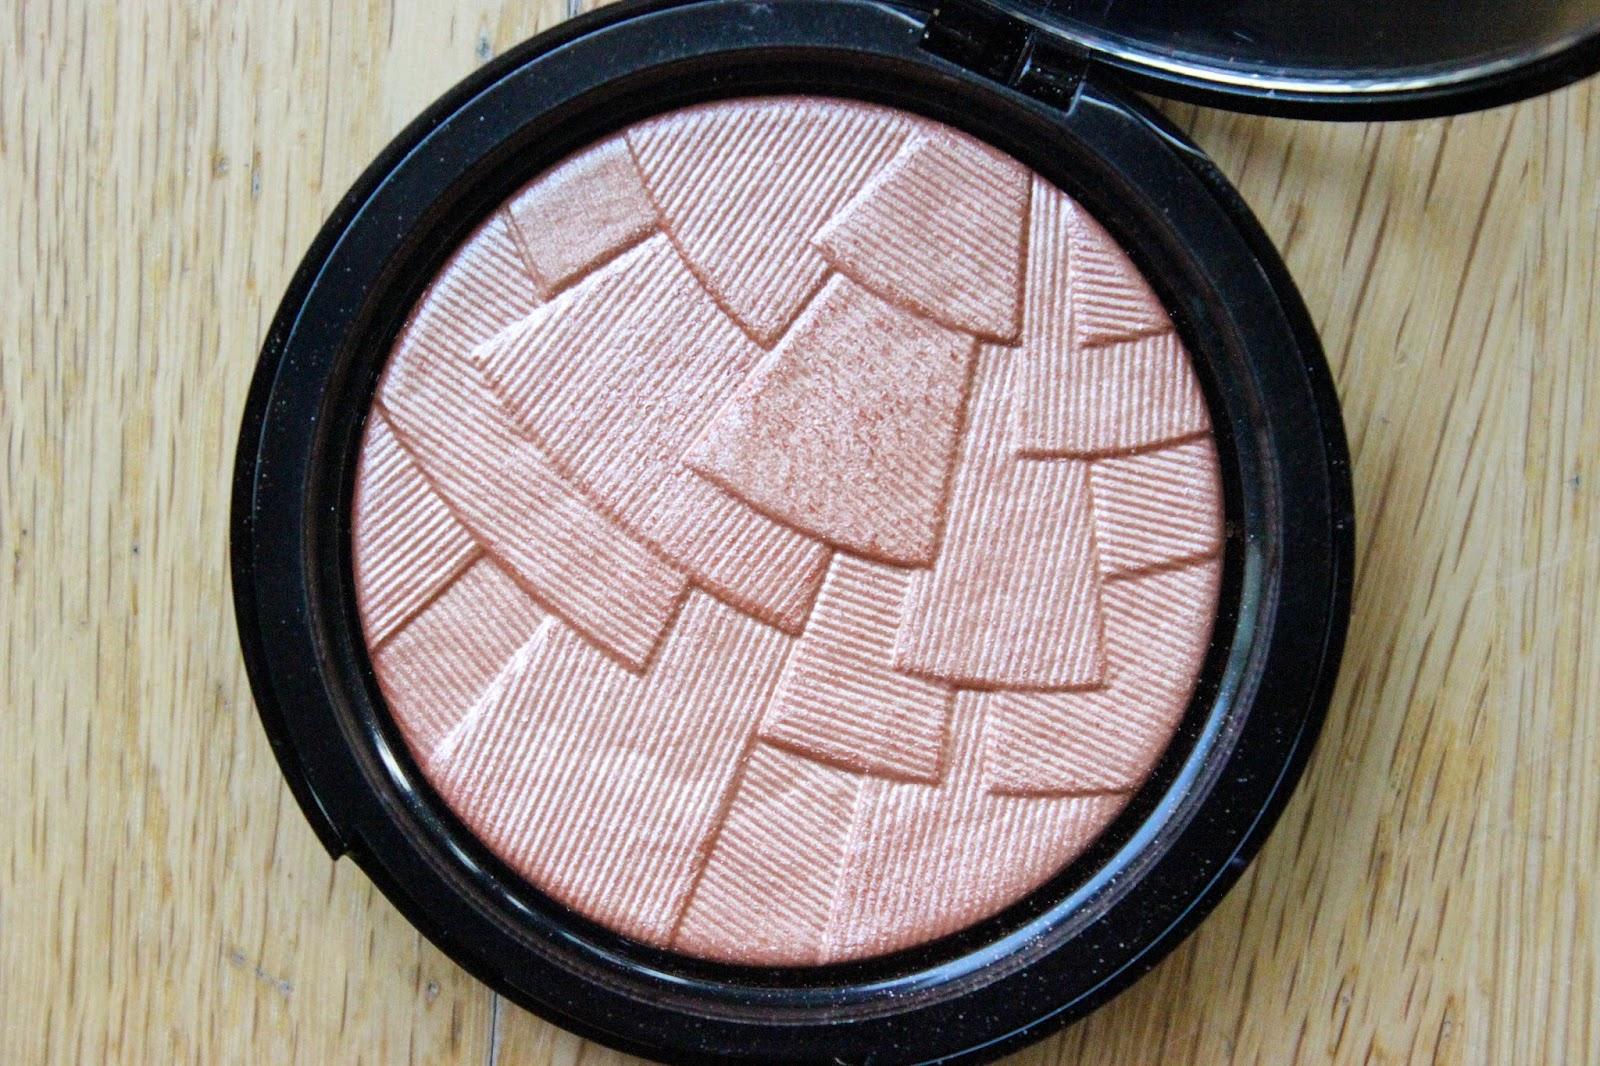 anastasia beverly hills illuminator peach nectar nc50 black skin dark skin beauty blogger review woc uk abh nataliekayo discoveriesofself